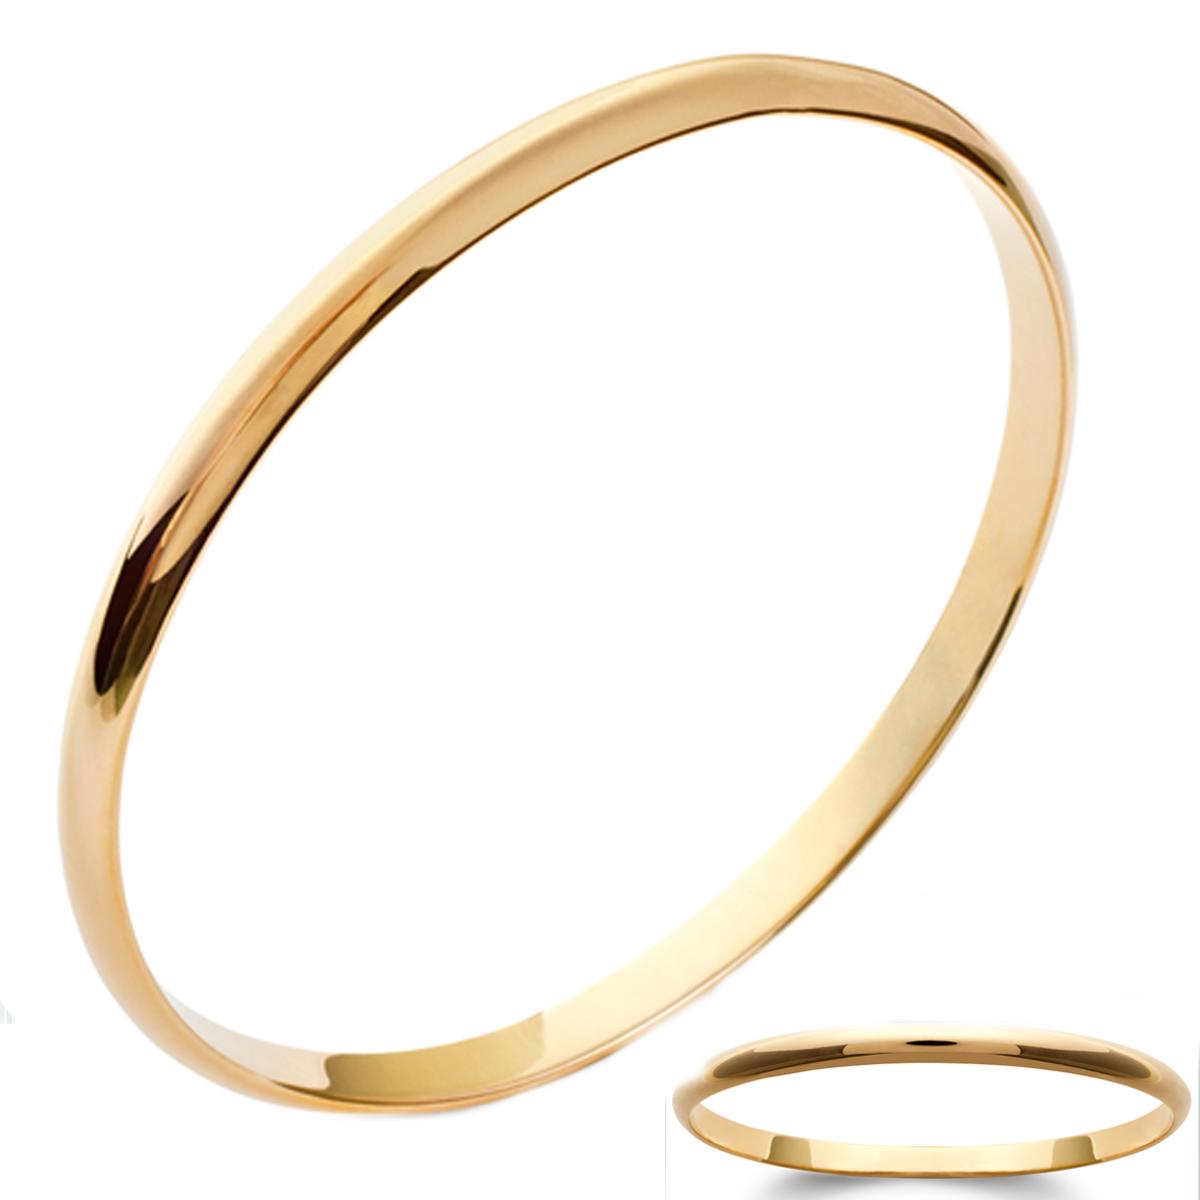 Bracelet Plaqué Or \'Demi-Jonc\' 66 mm 5 mm - [B9452]